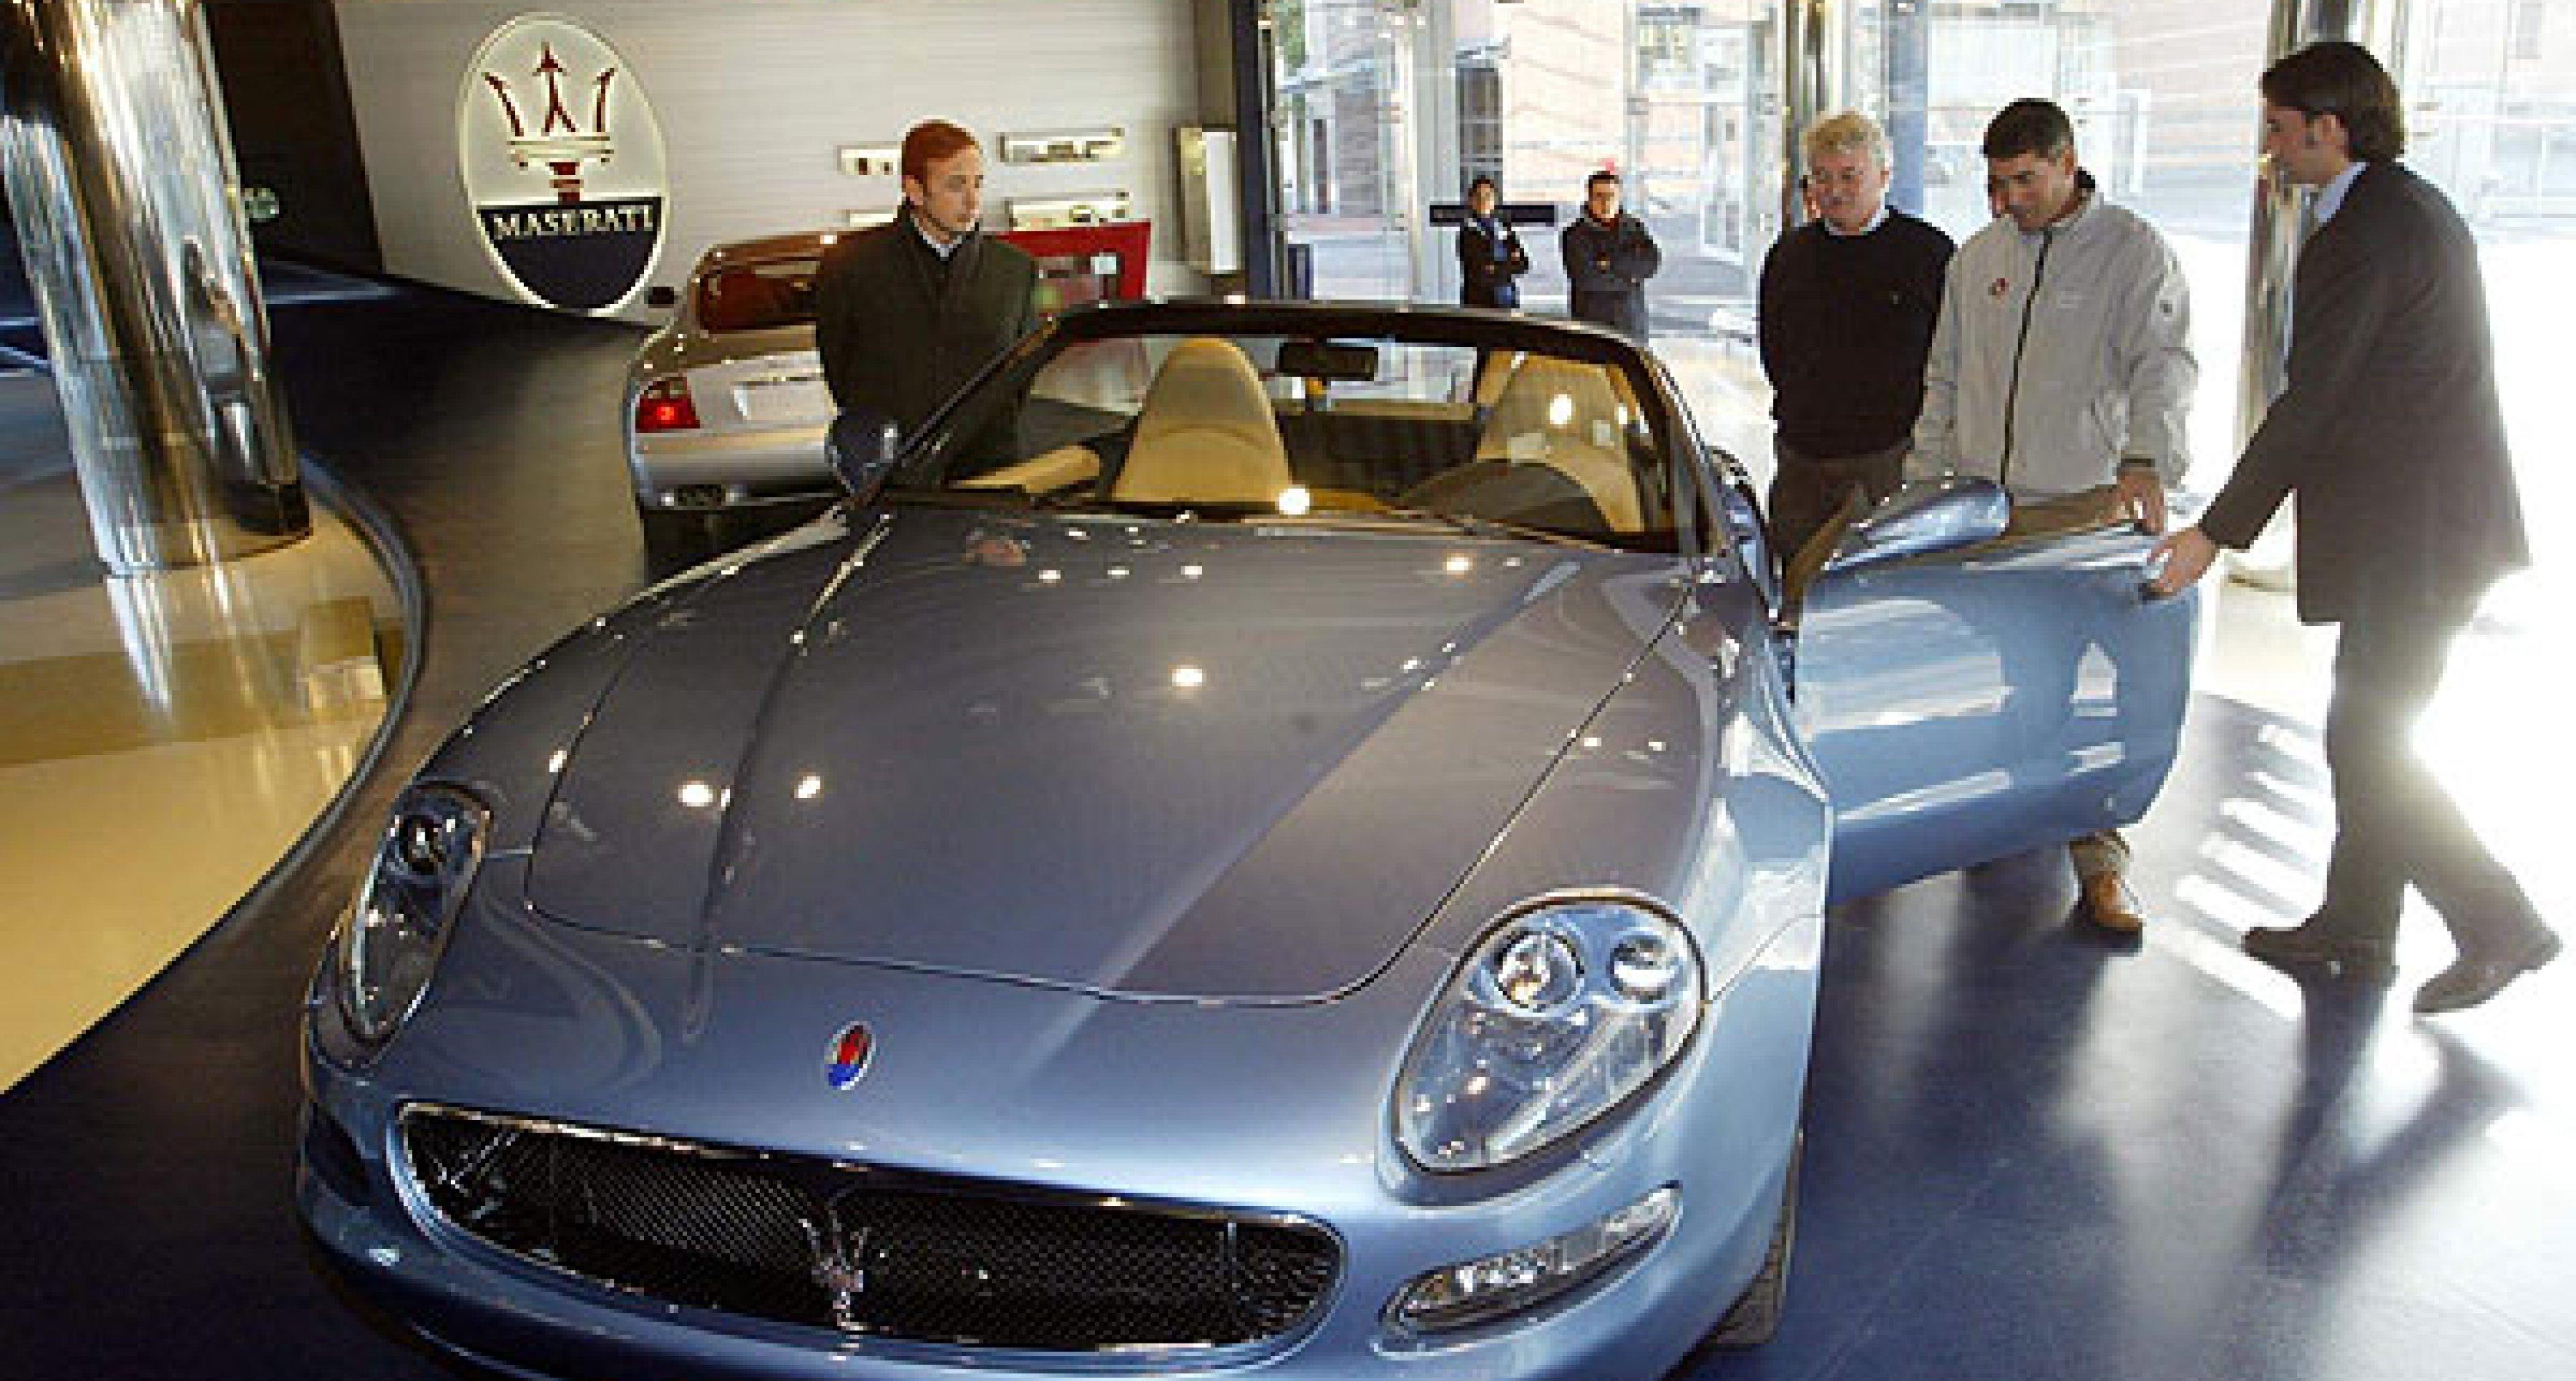 Segel-Champions zu Besuch bei Maserati